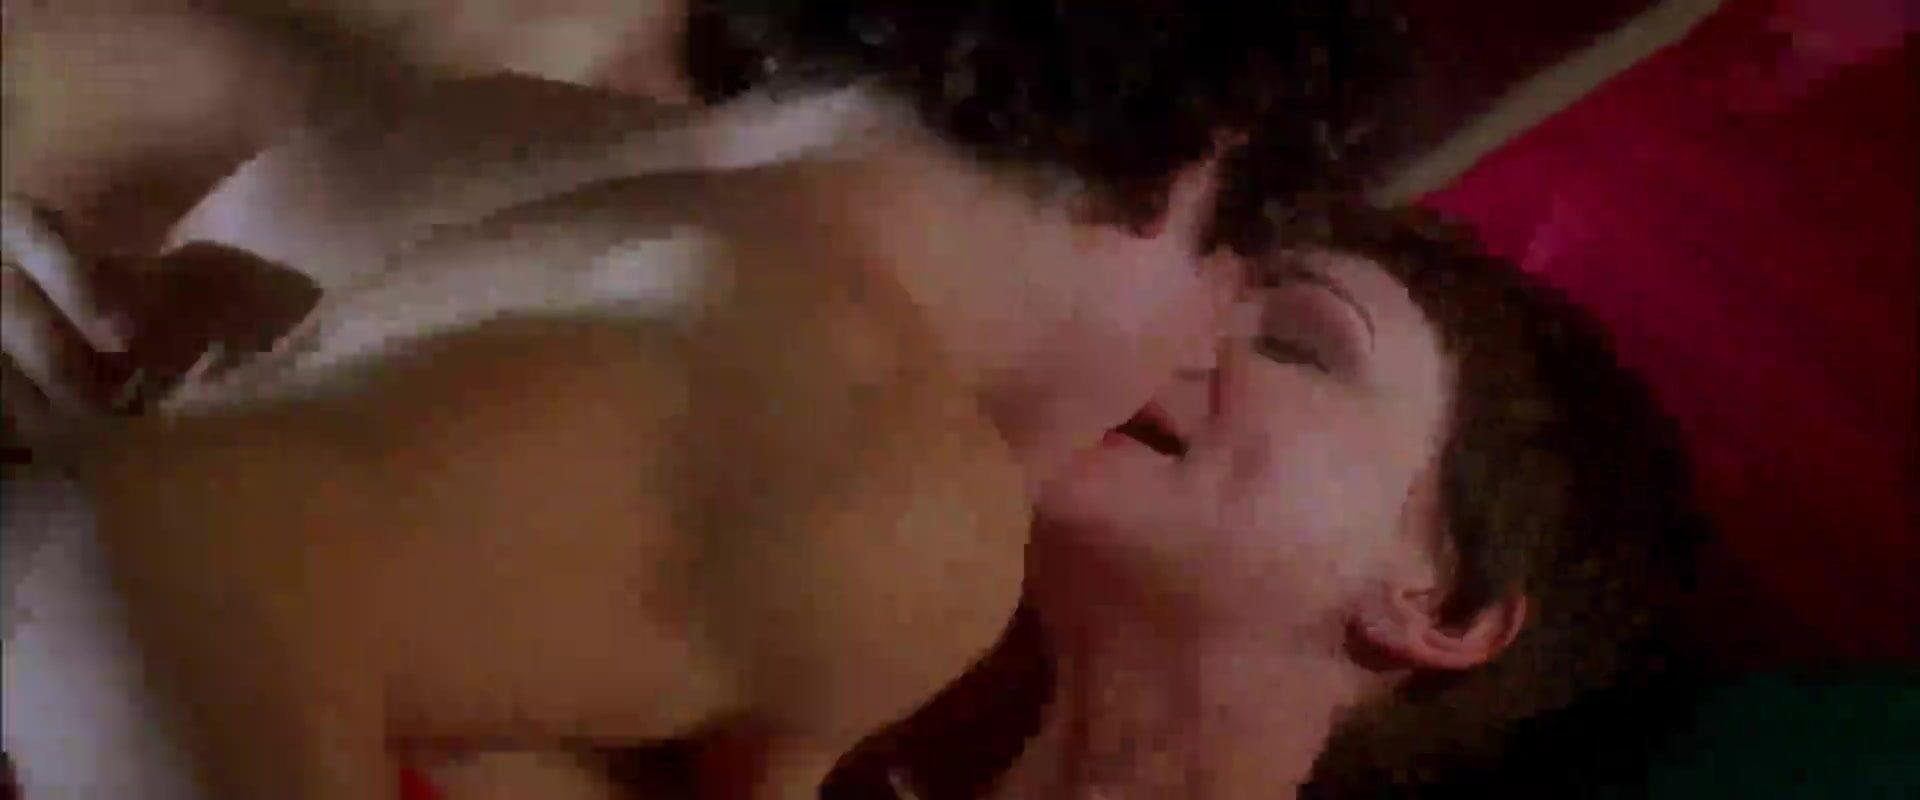 Ana Alexander Chemistry Sex Scene ana alexander in chemistry – babe, celeb, celebrity-nudes